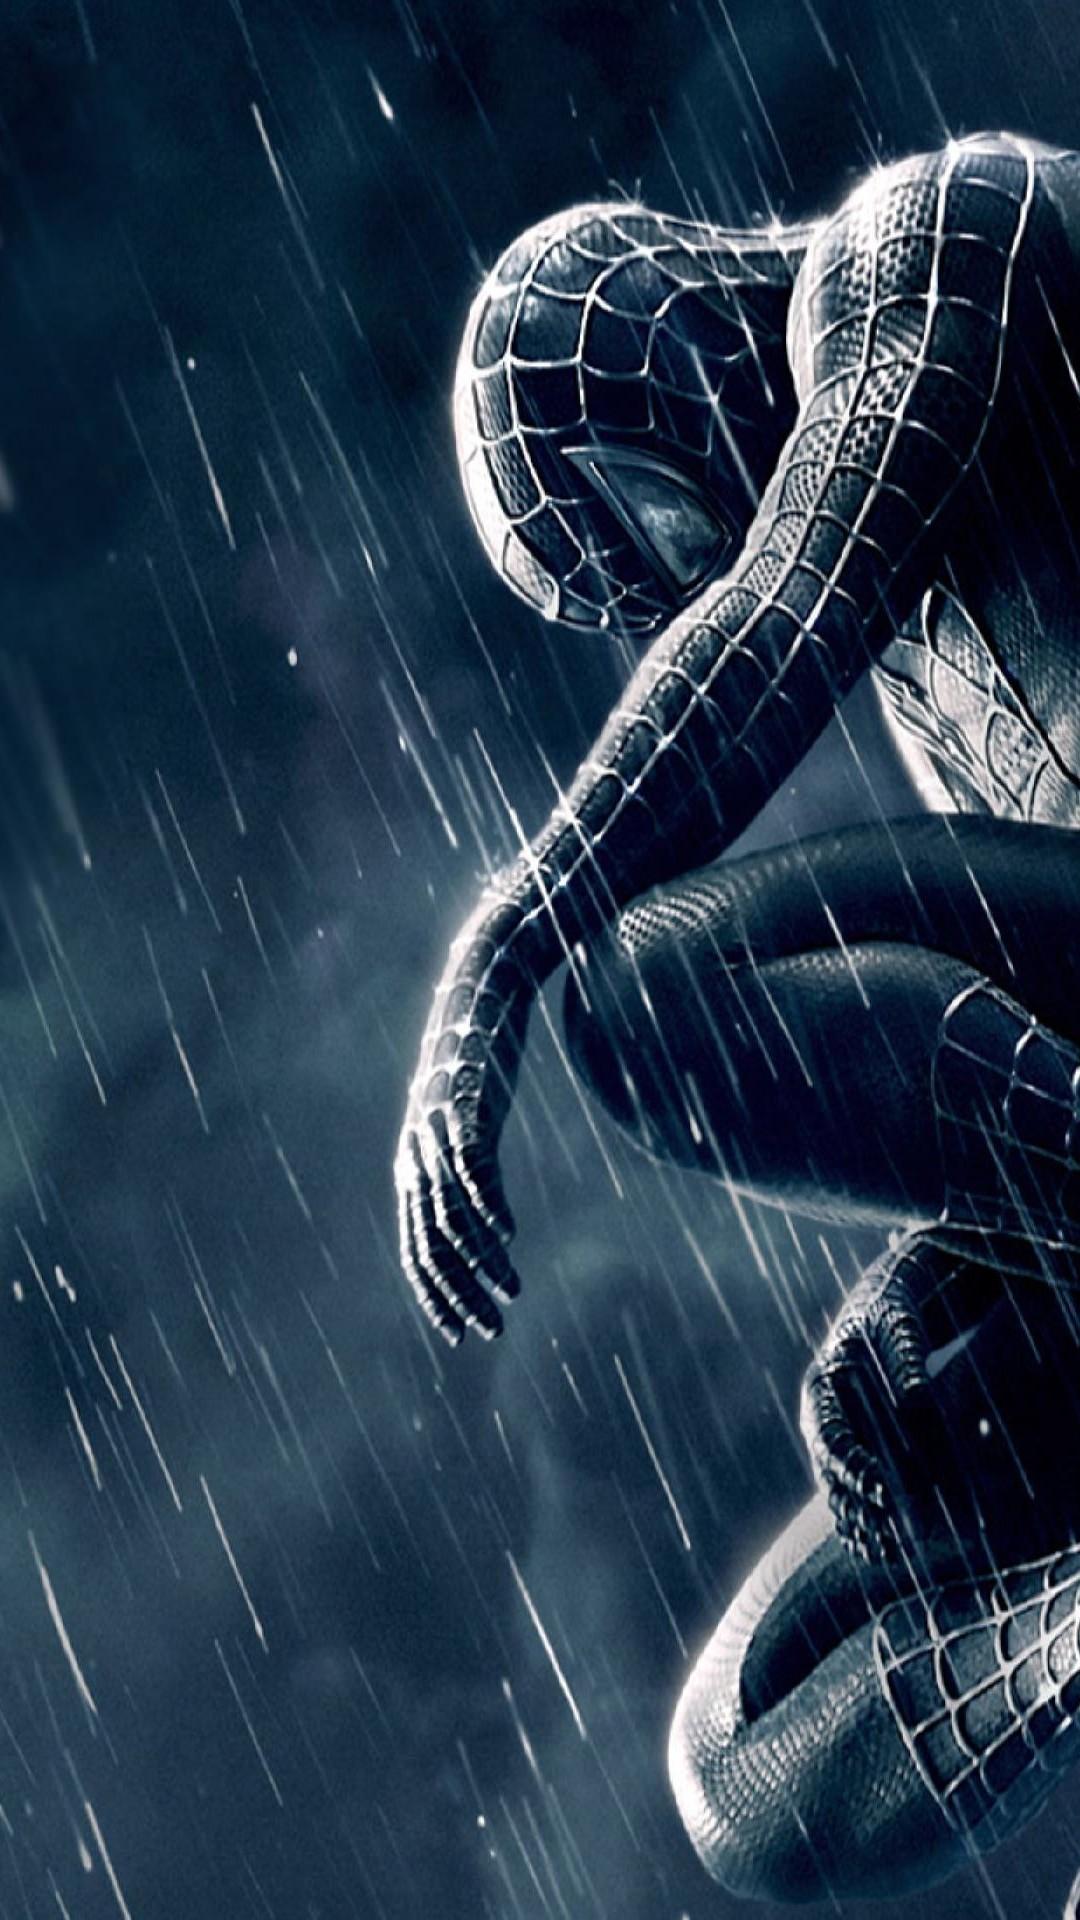 Spiderman 3 Rain iPhone 6 Plus HD Wallpaper …